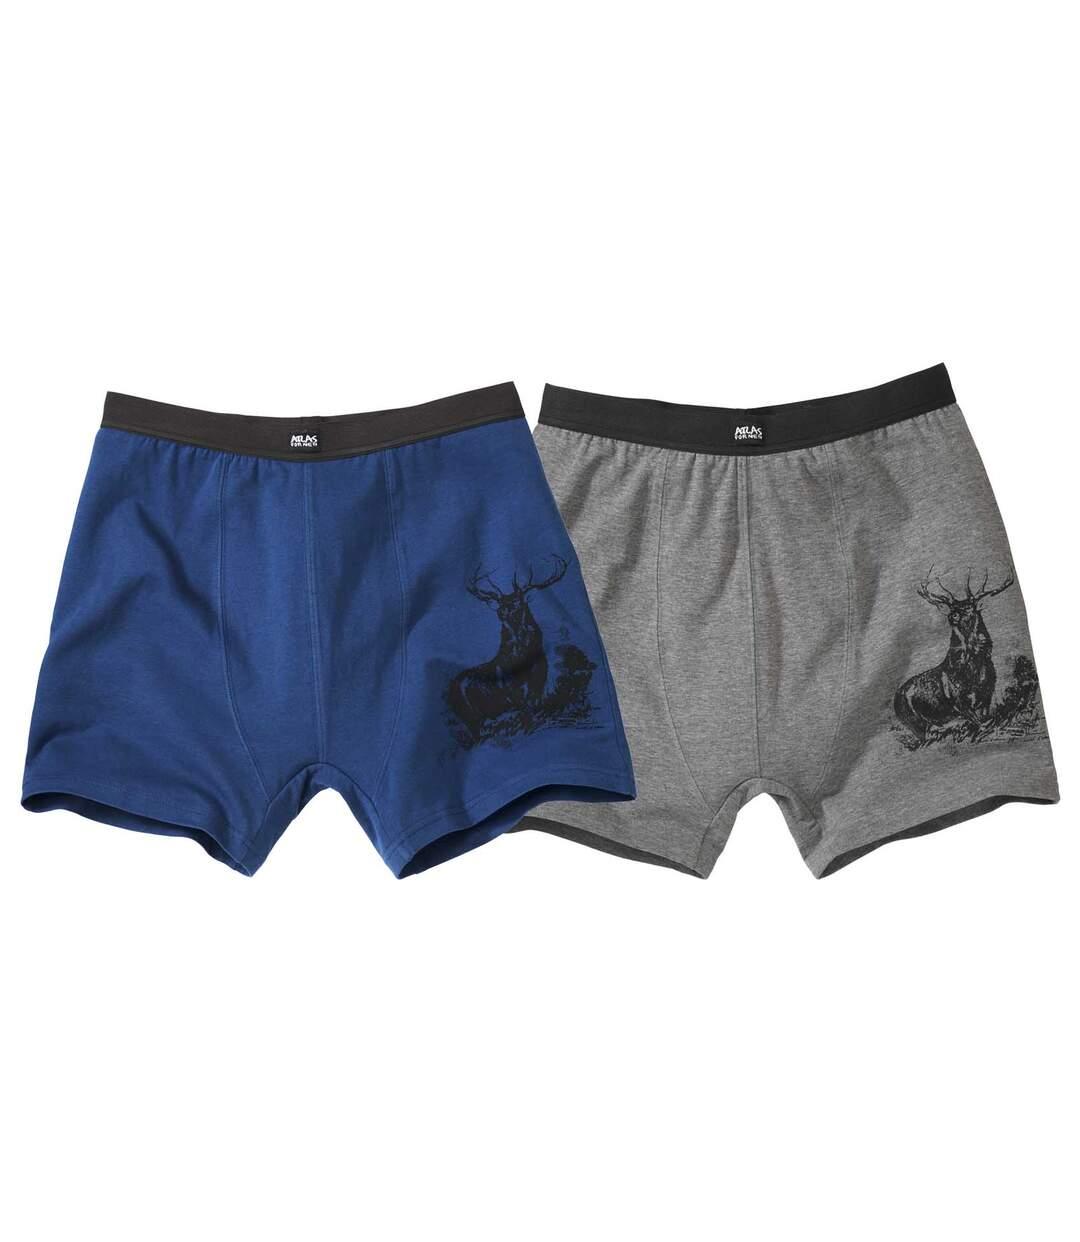 Pack of 2 Men's Comfort Boxers - Blue and Grey Atlas For Men